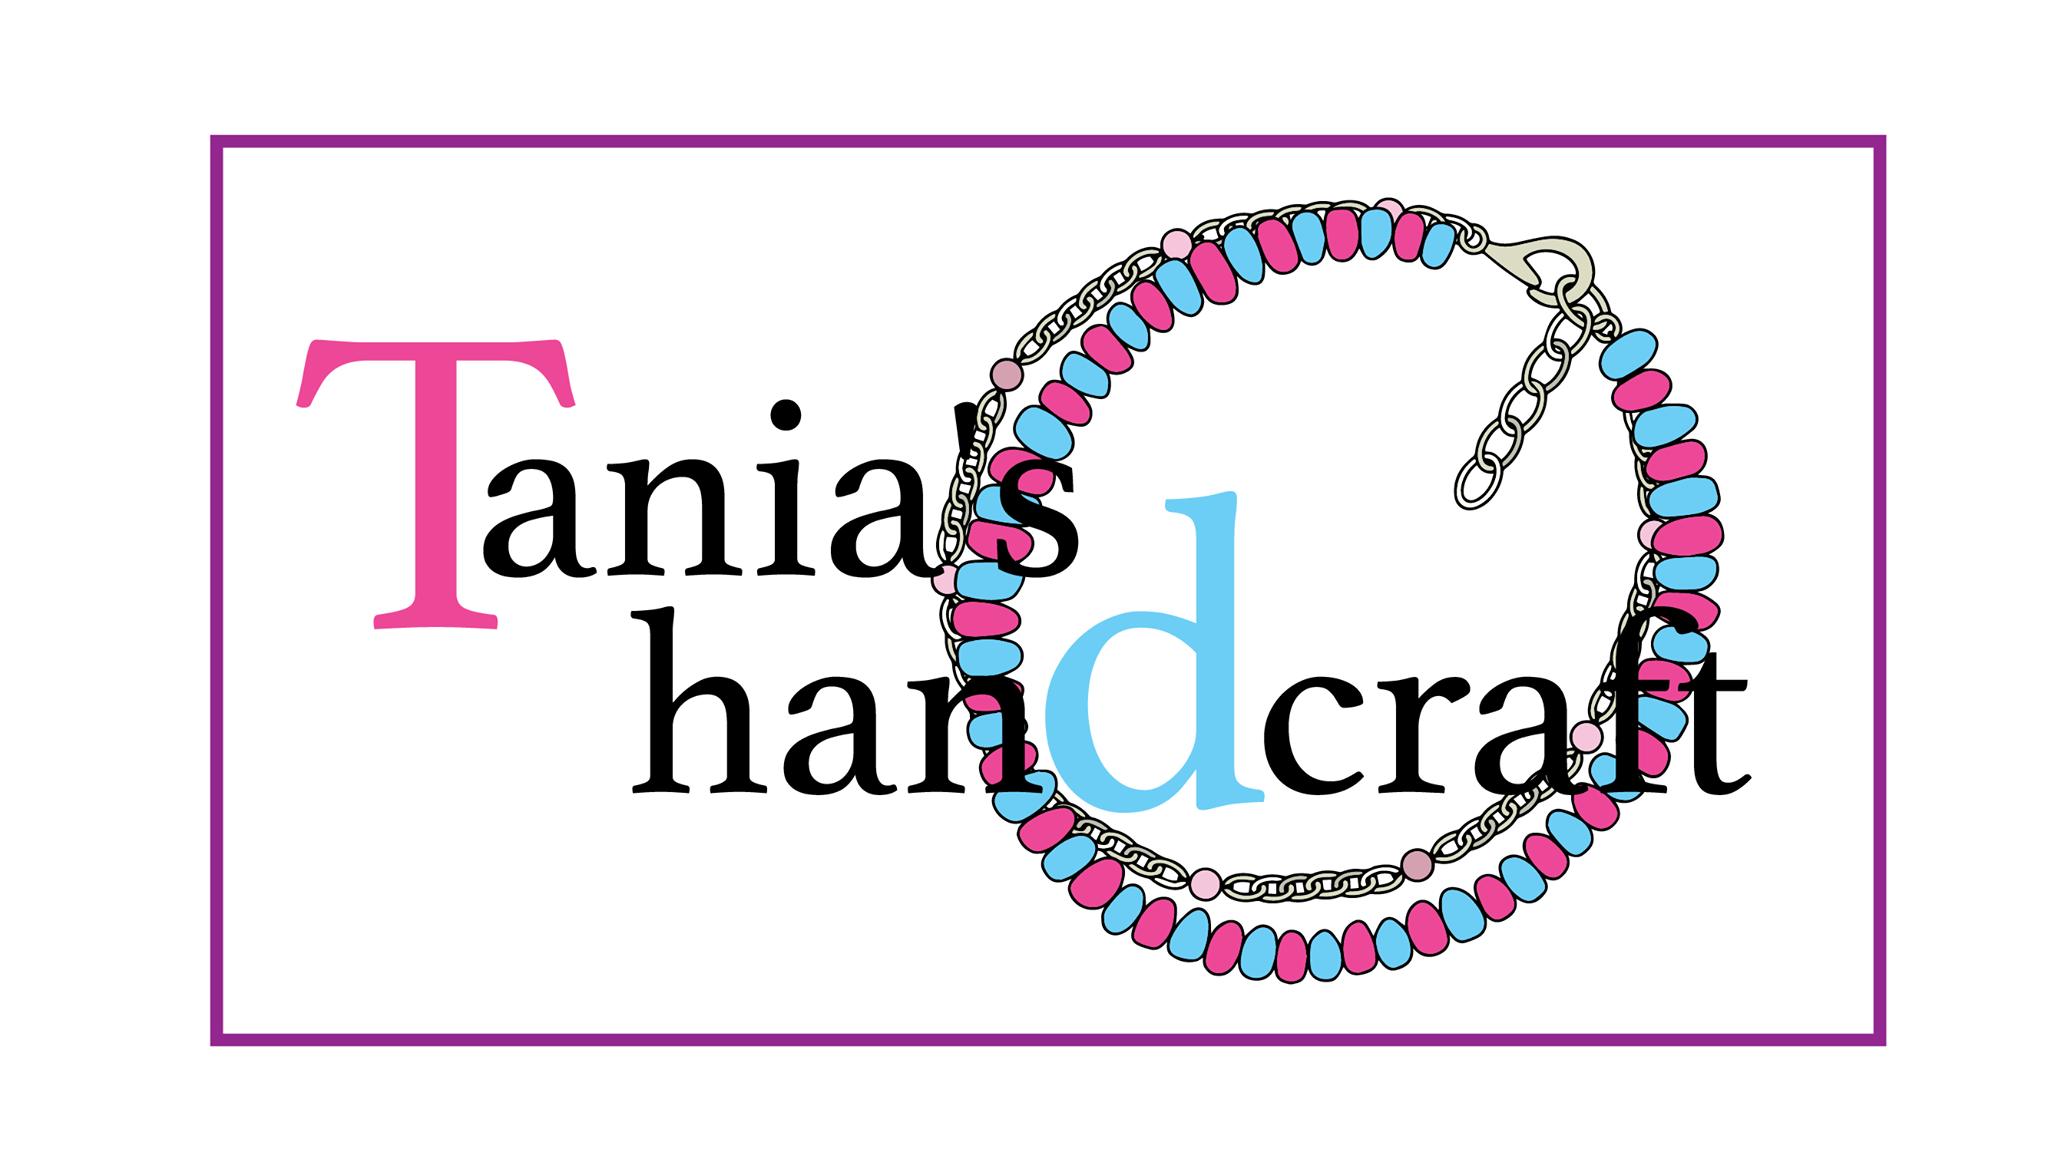 Tania's handcraft